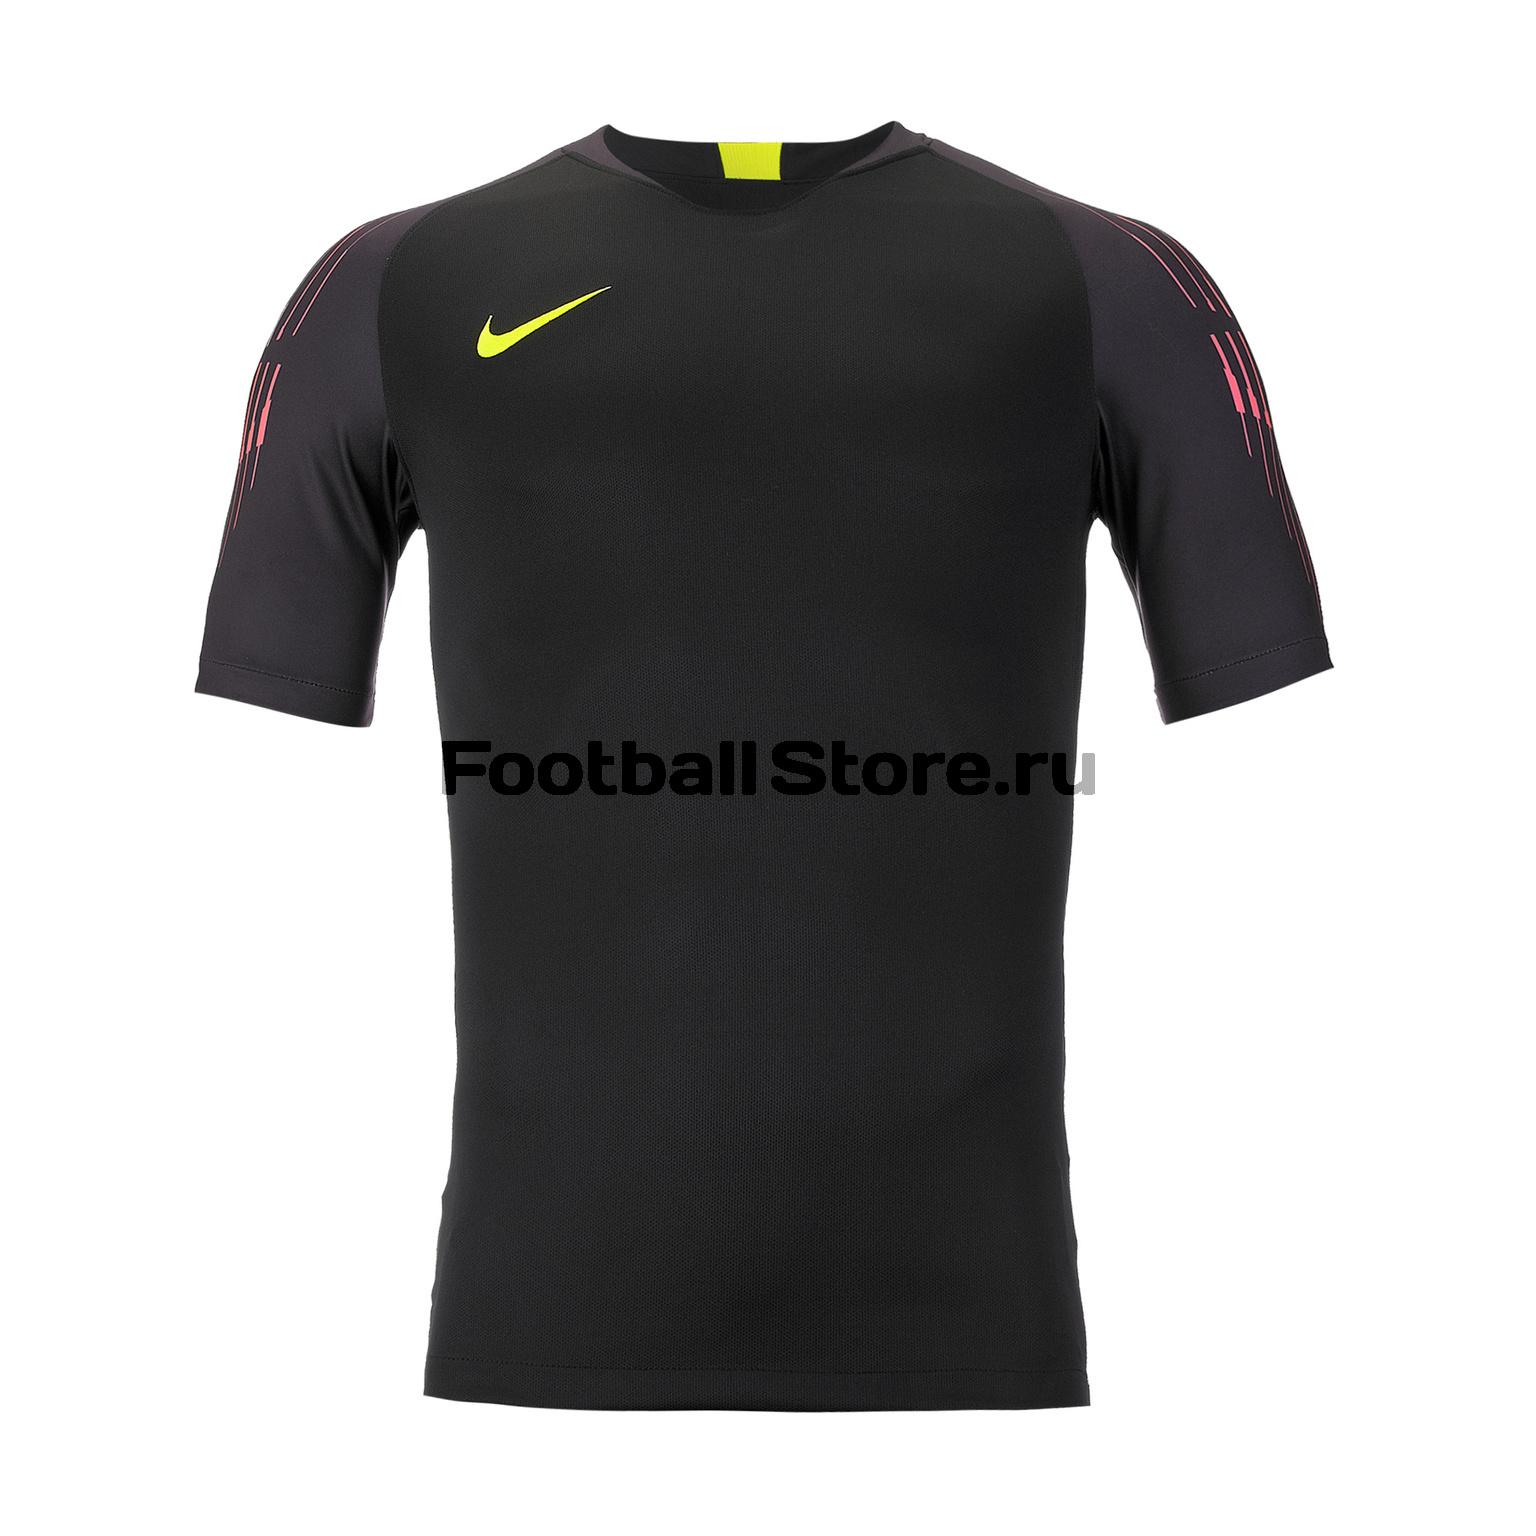 Вратарская футболка Nike Gardien II GK SS 894512-010